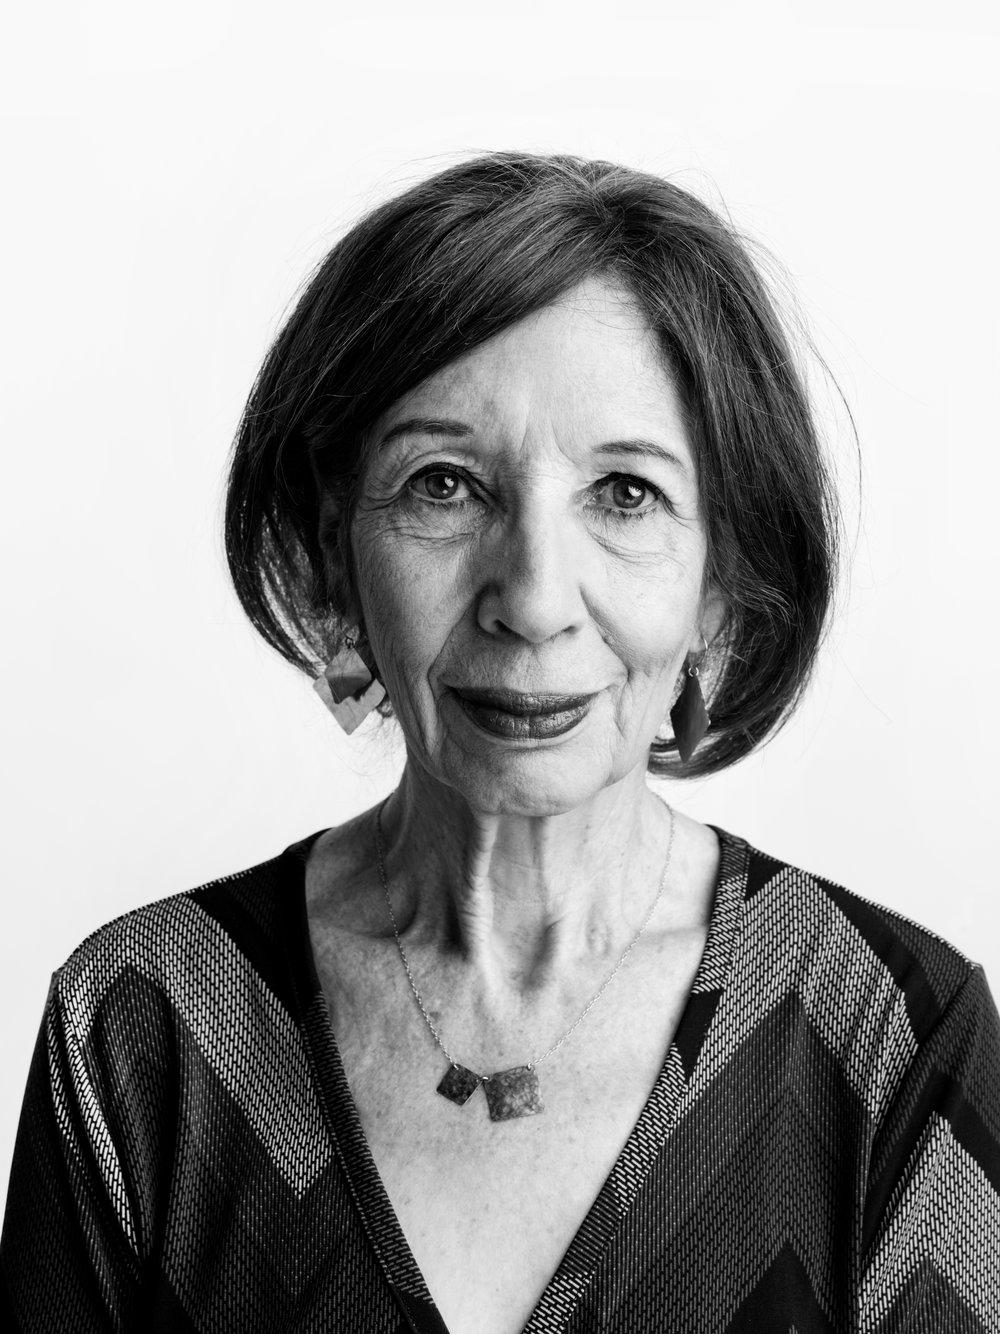 LUCY KOMISAR | WRITER, 1960S-1970S